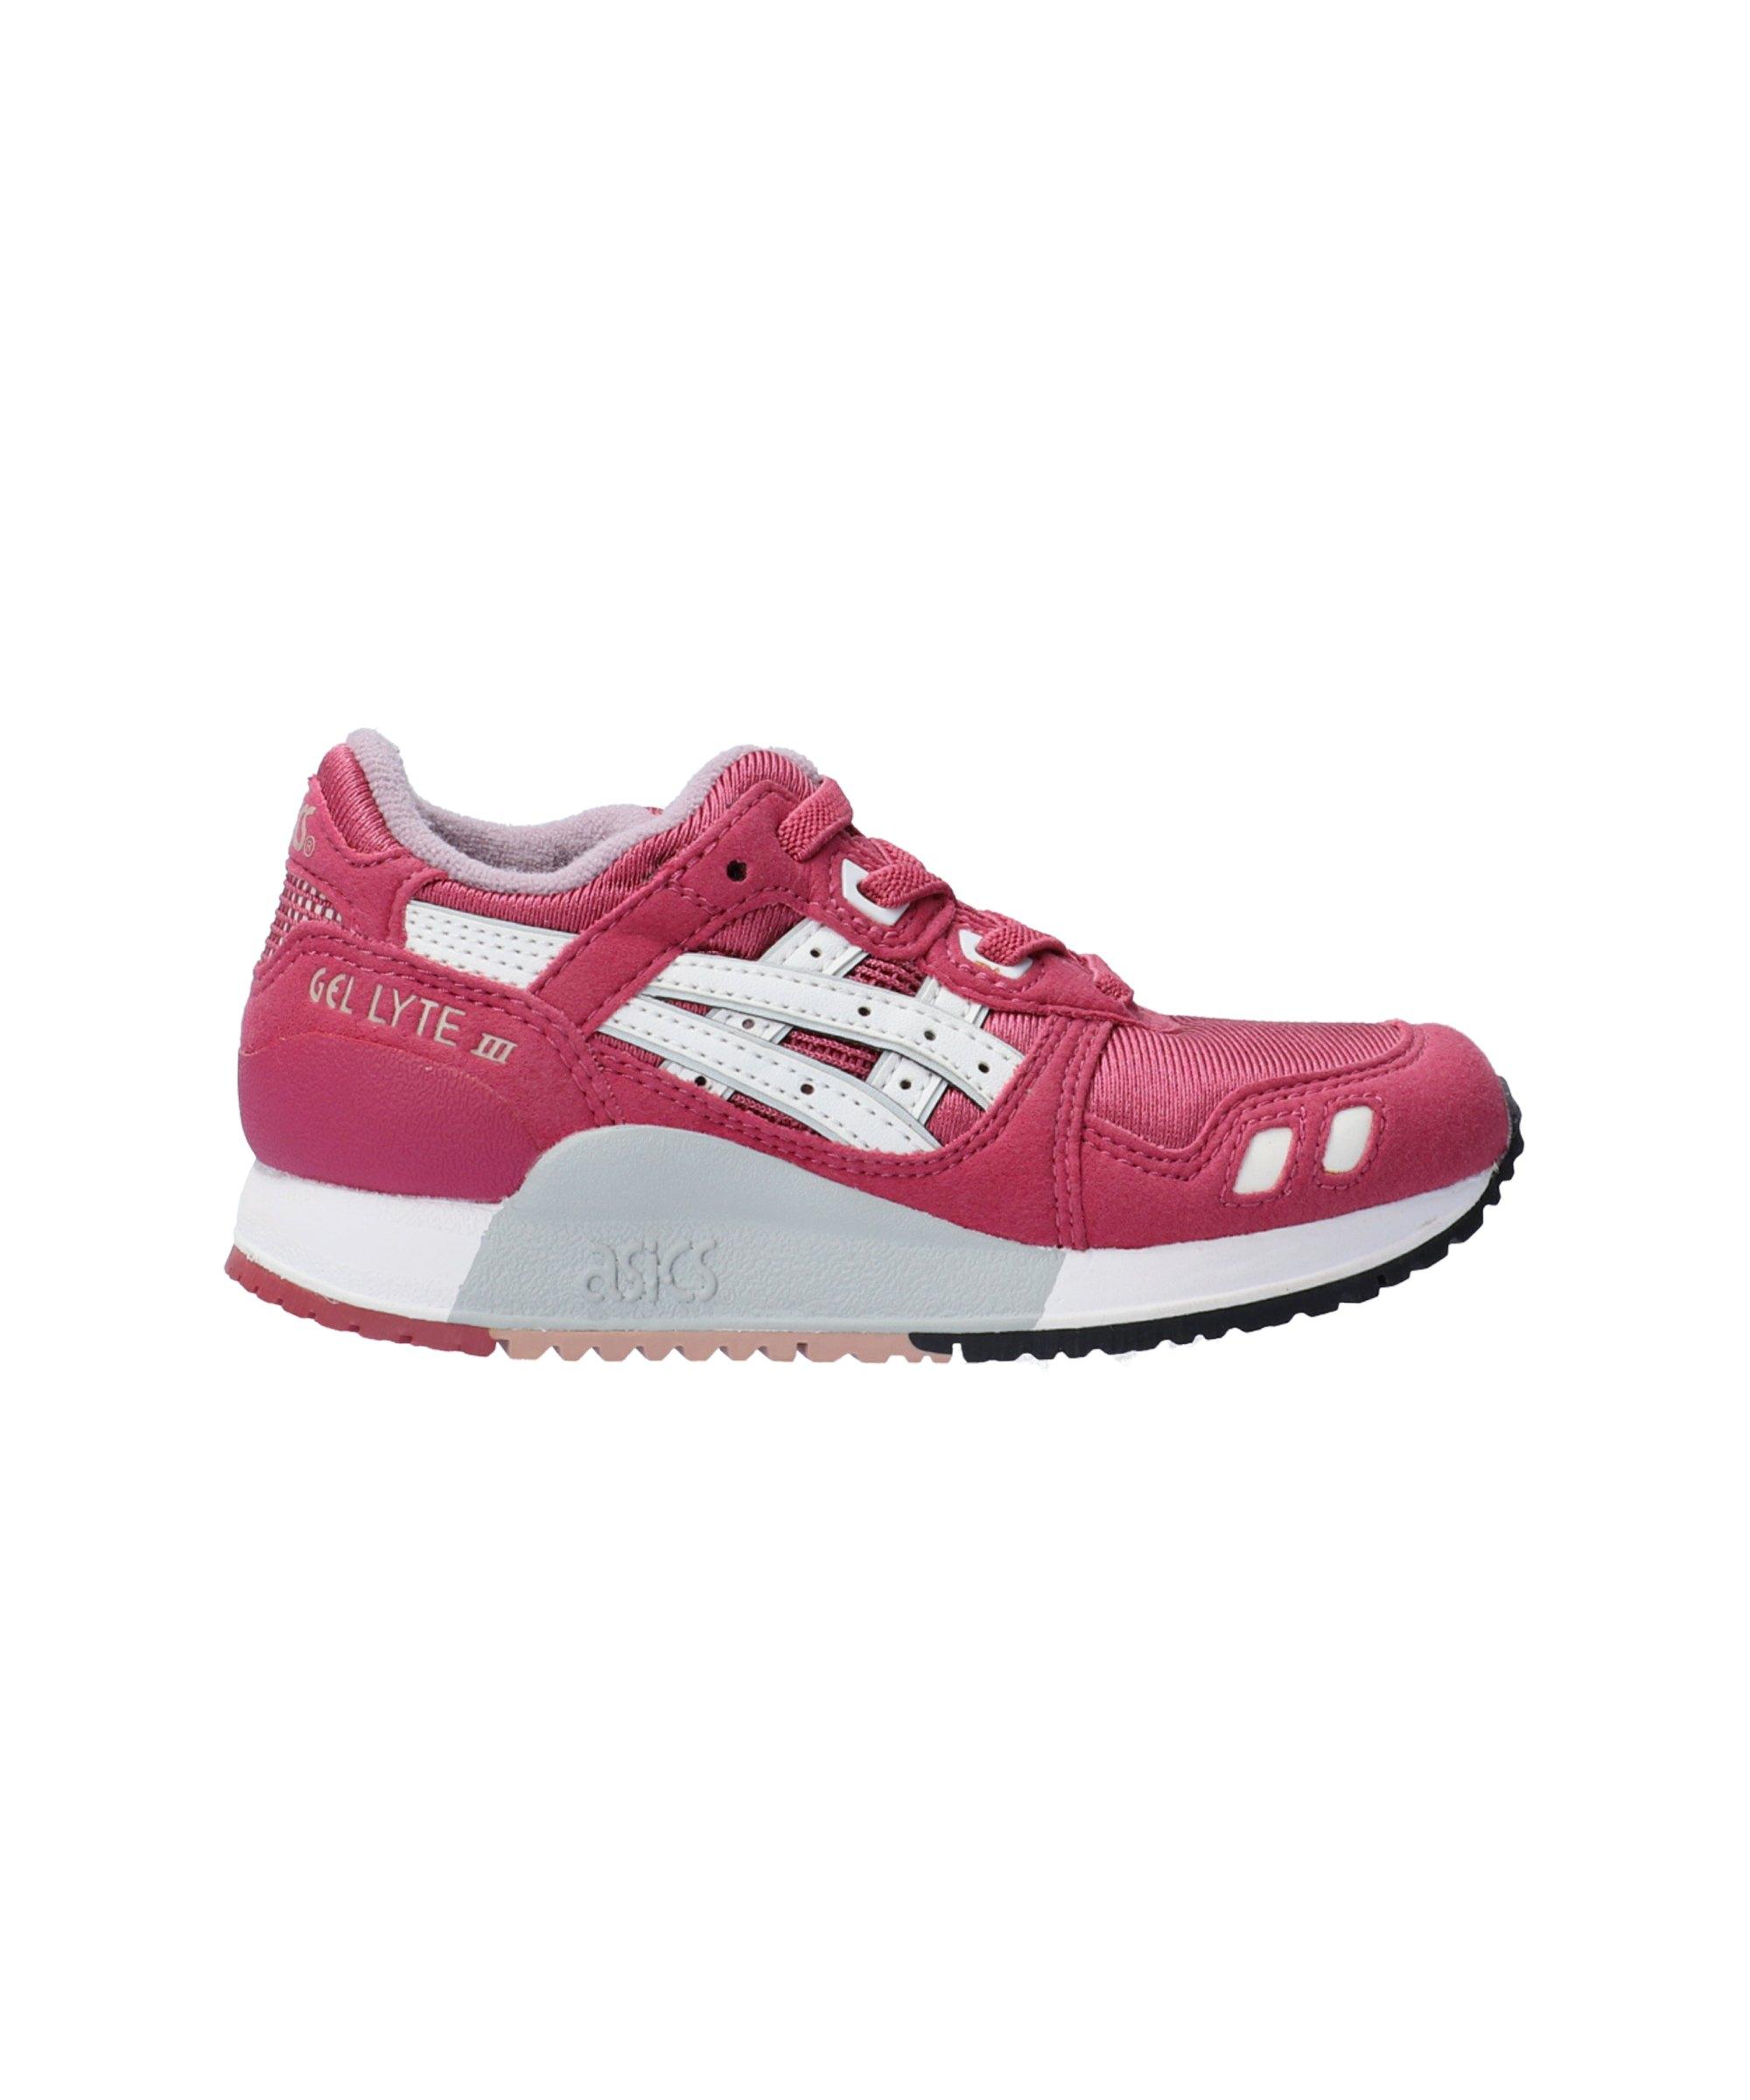 Asics Tiger Gel-Lyte III PS Sneaker Kids Pink F3201 - Pink